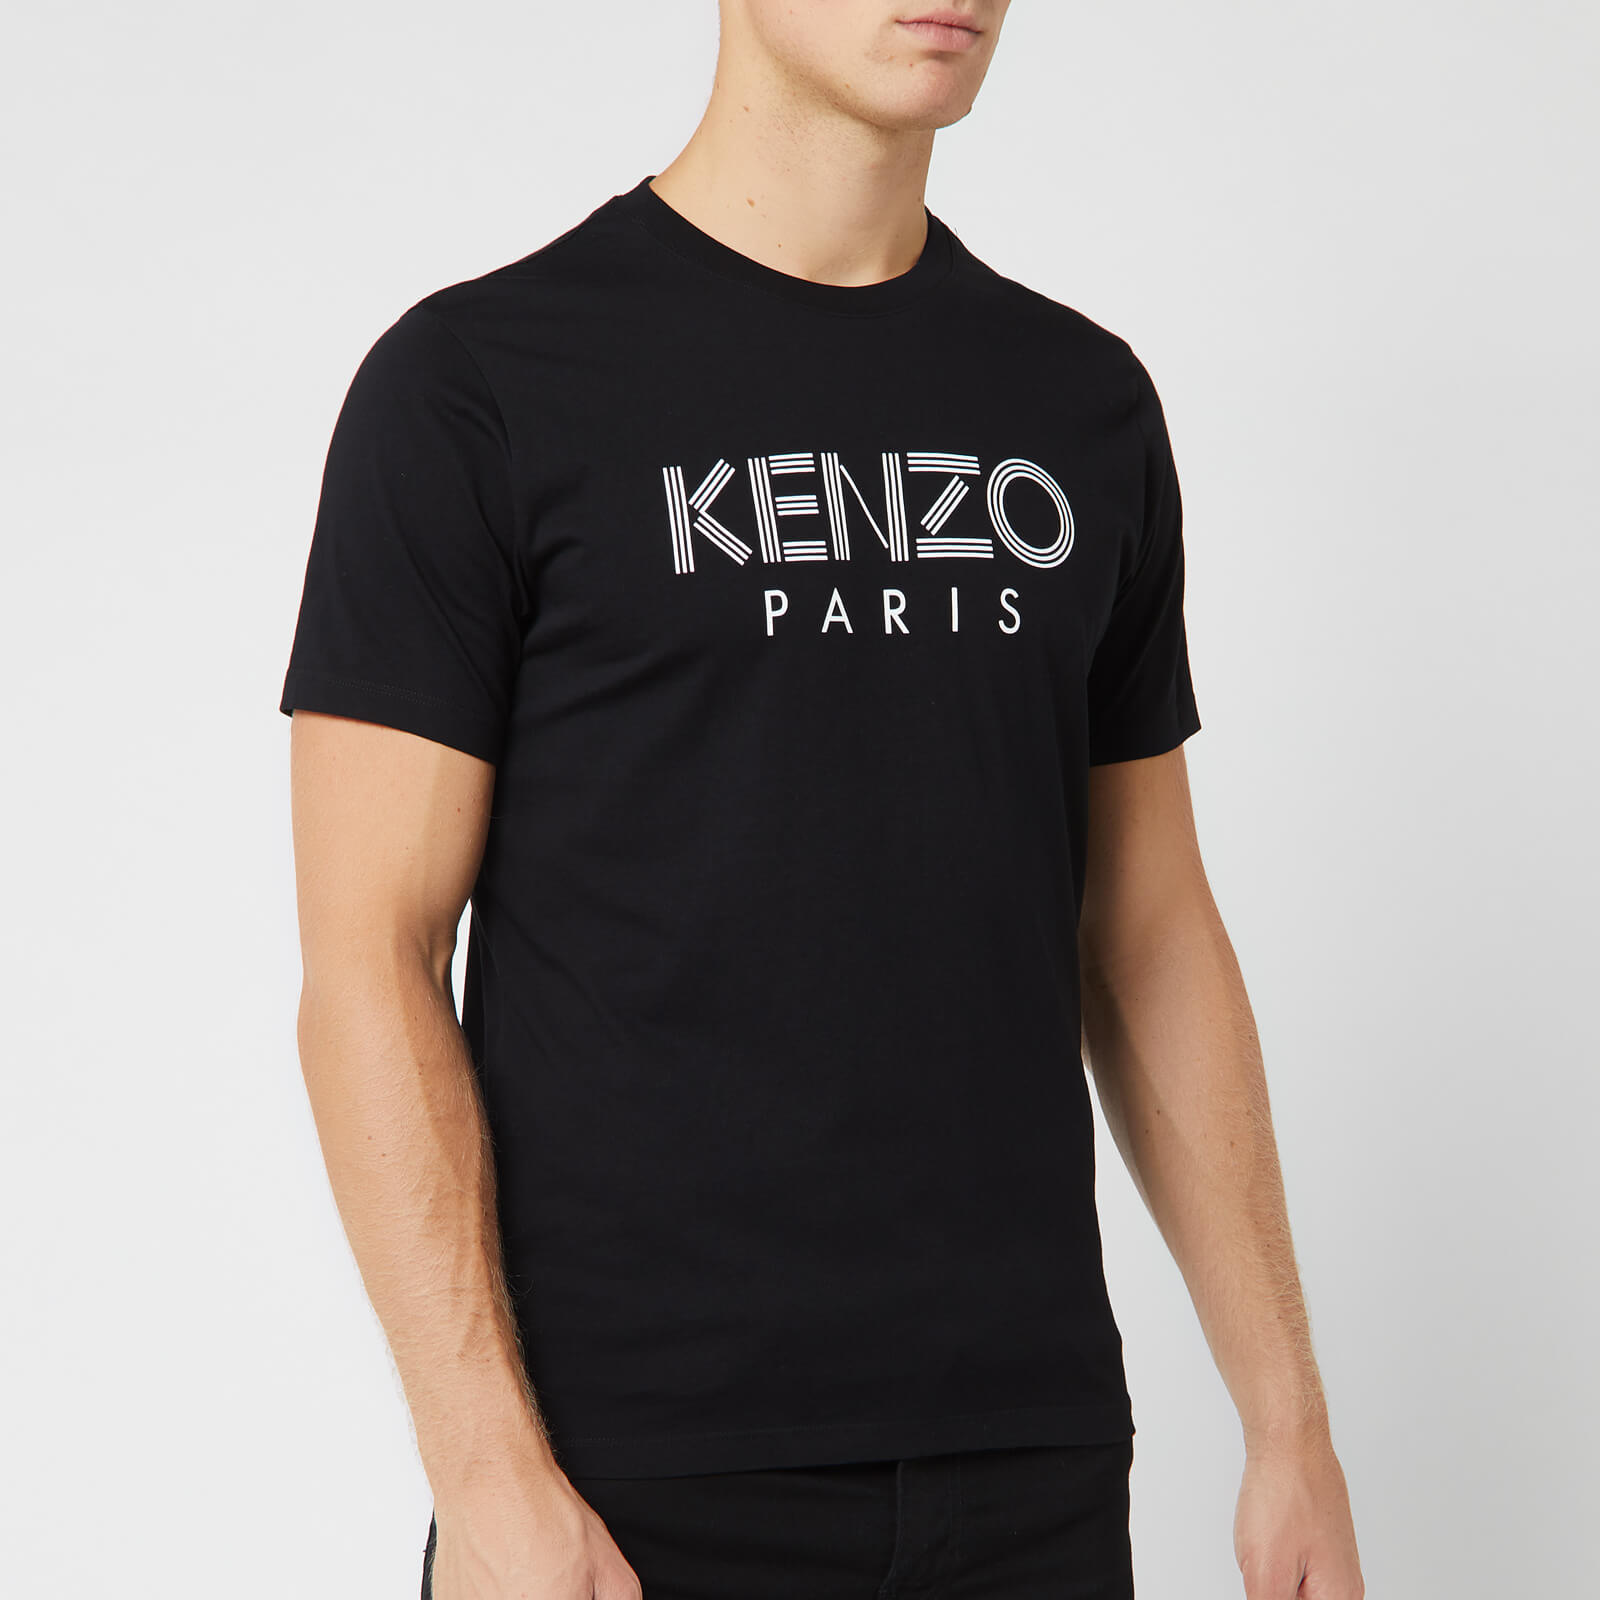 2bc94038 KENZO Men's Paris T-Shirt - Black